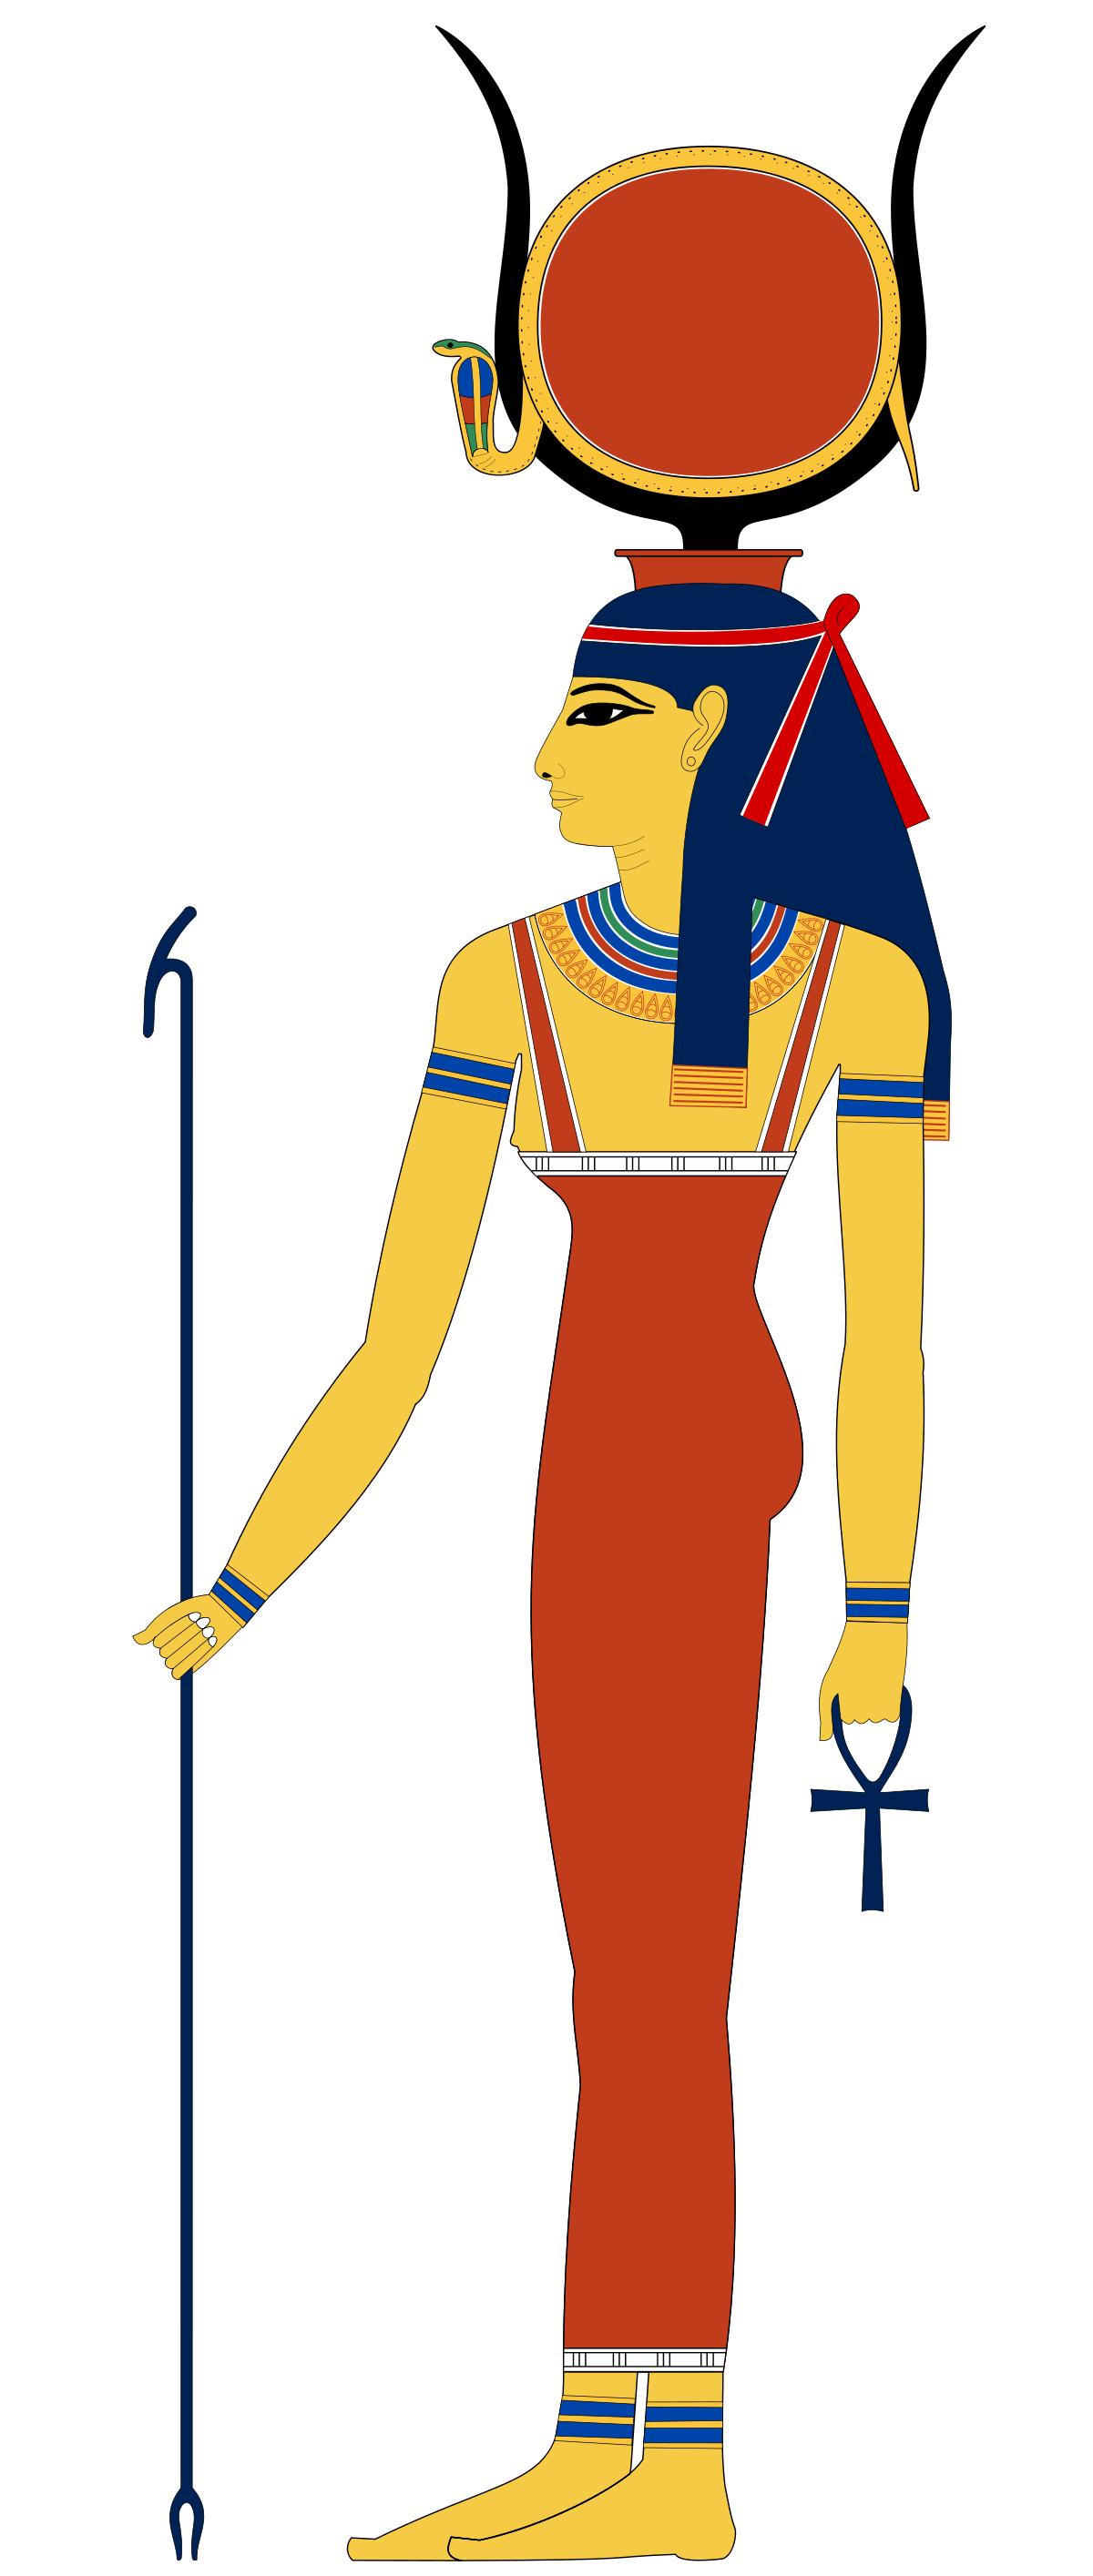 Ten commandments clipart positive. Hathor the goddess wearing